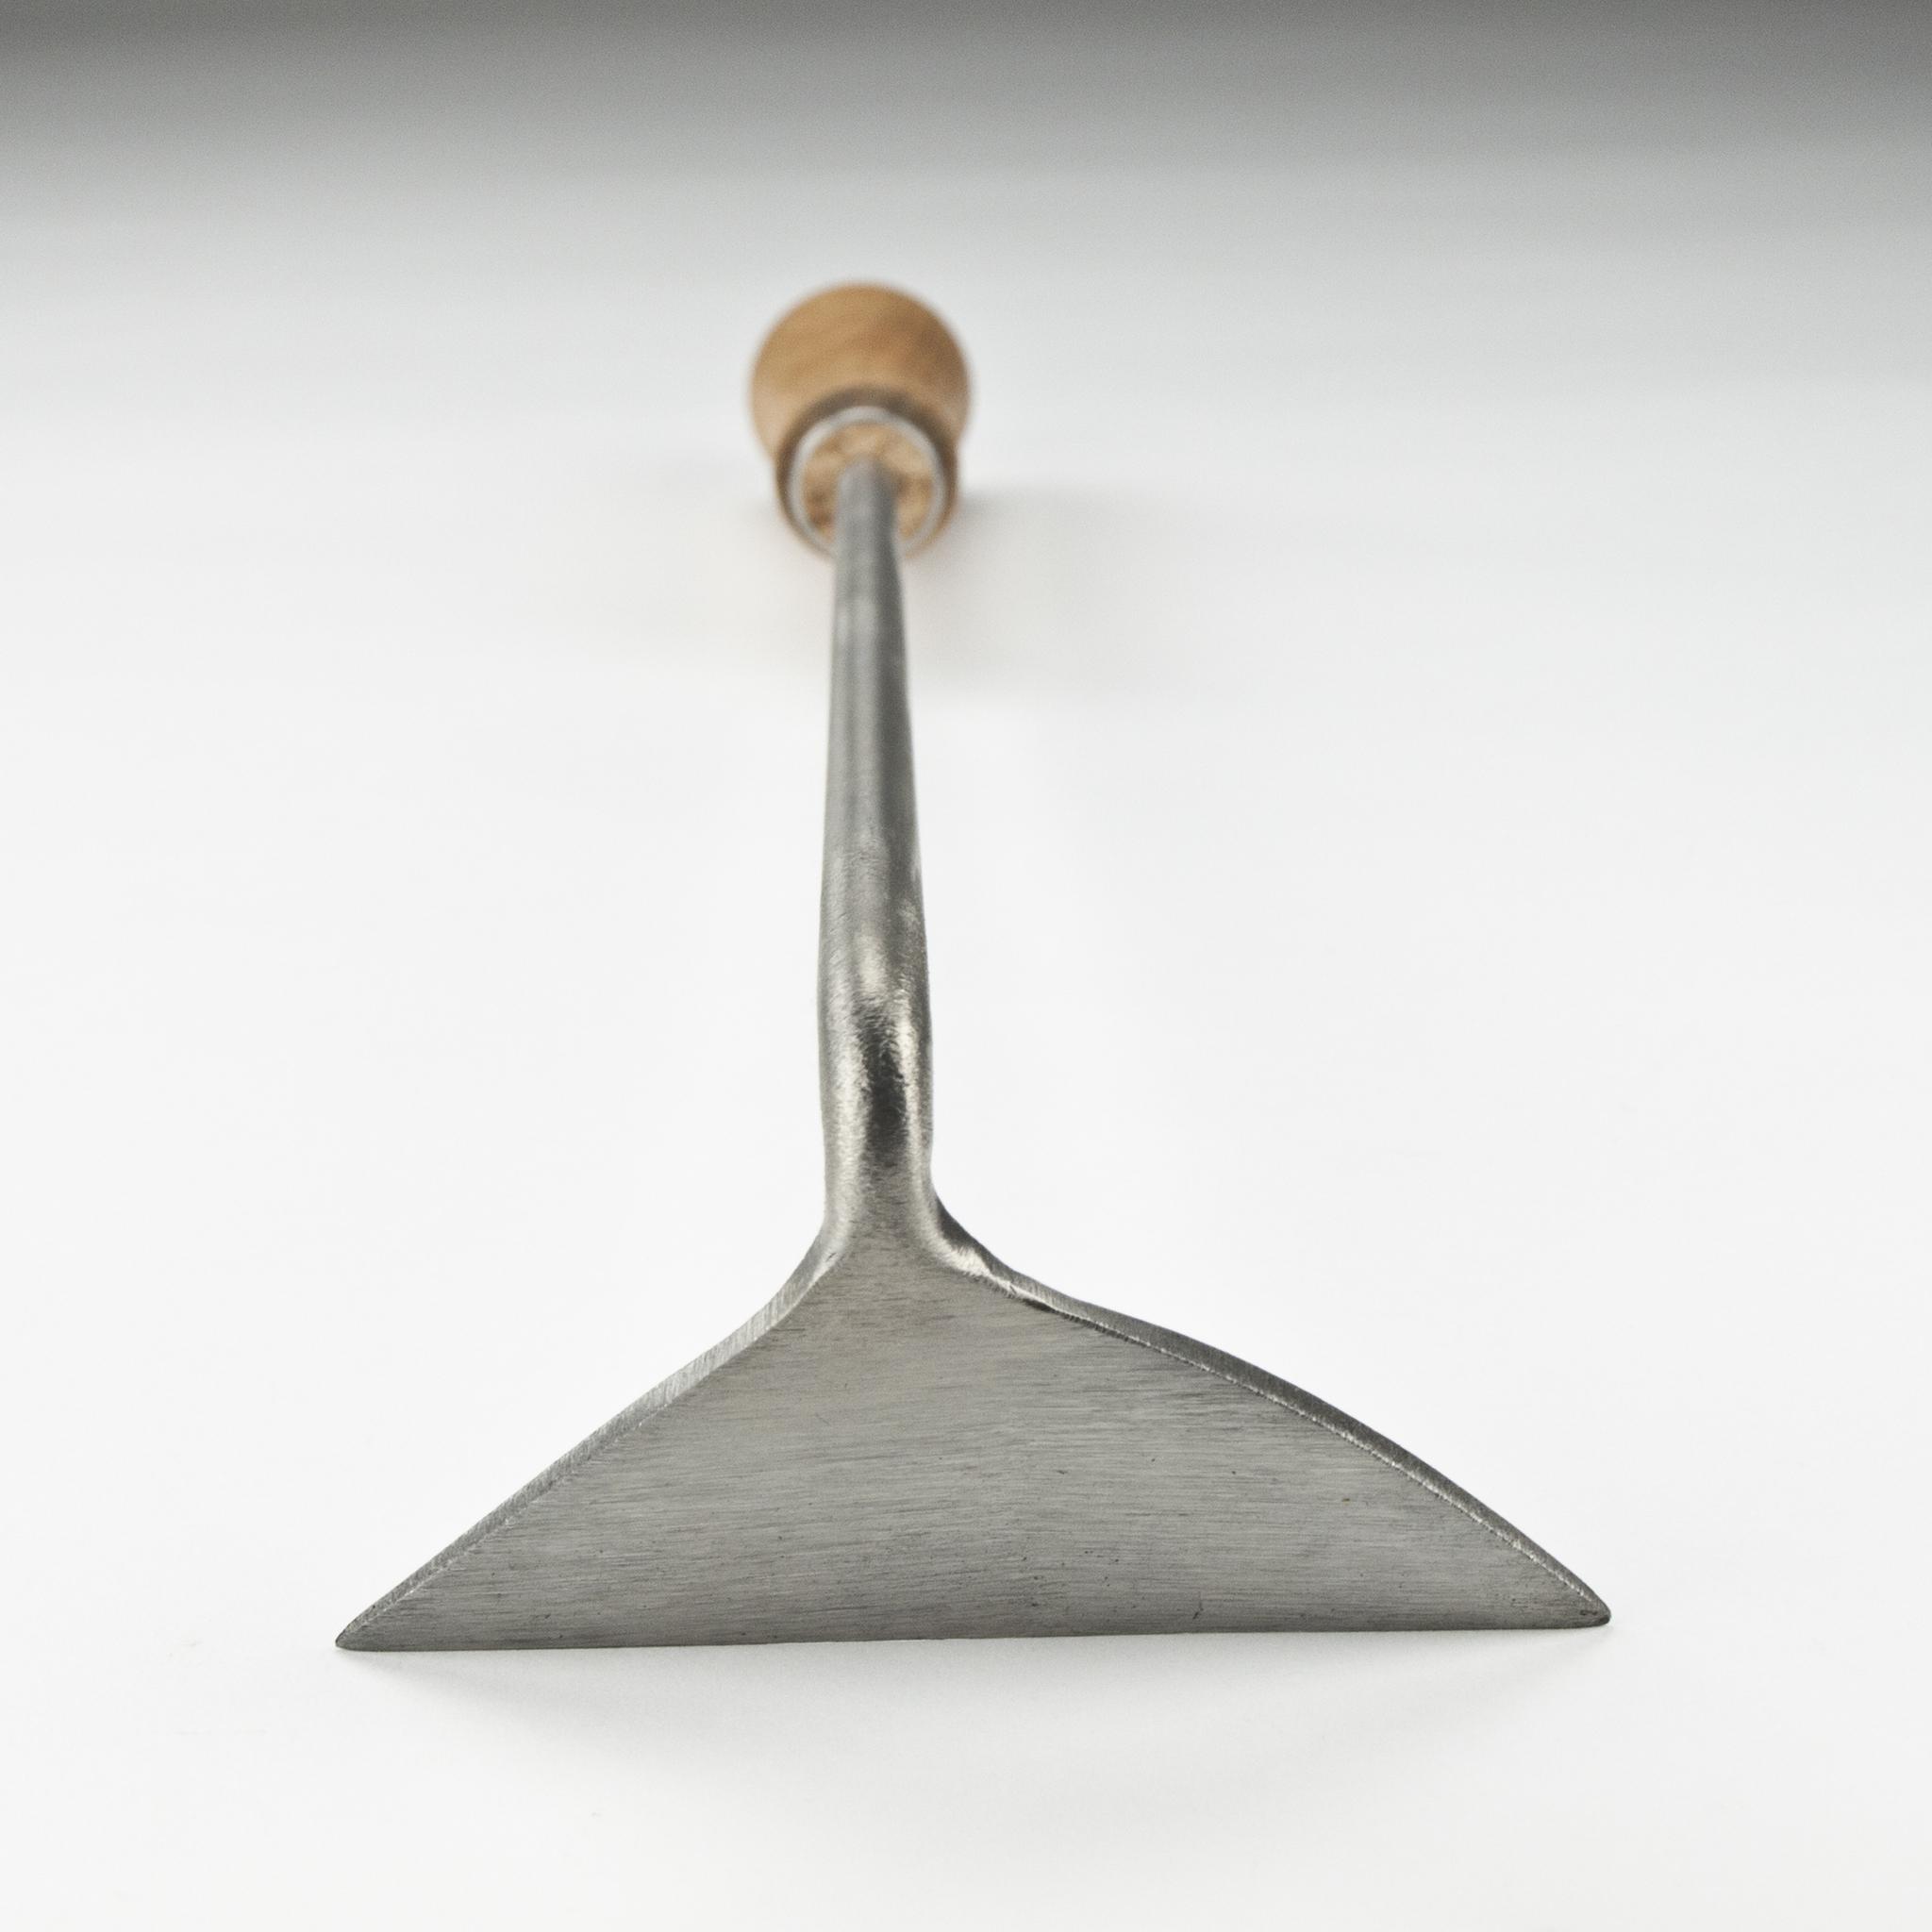 Мотыга ручная 10 см Sneeboer праворучная, ручка вишня